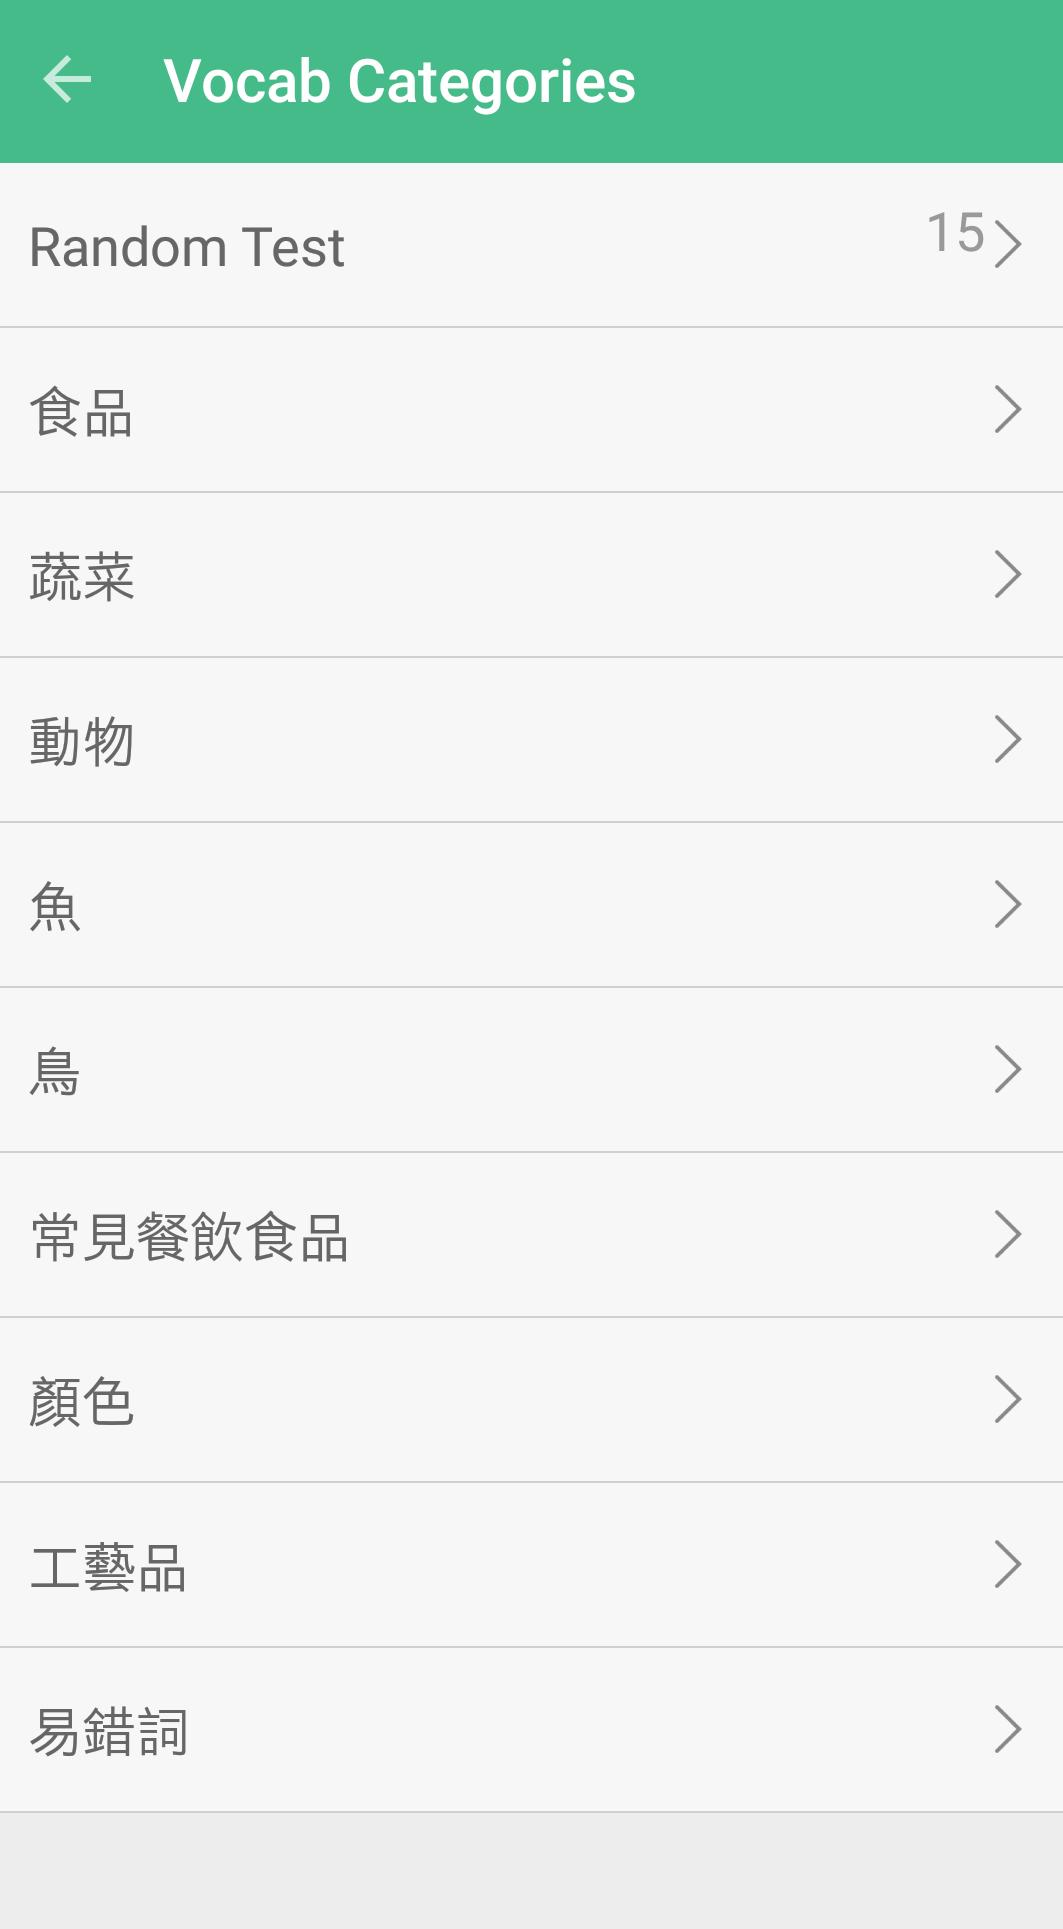 Vocab categories